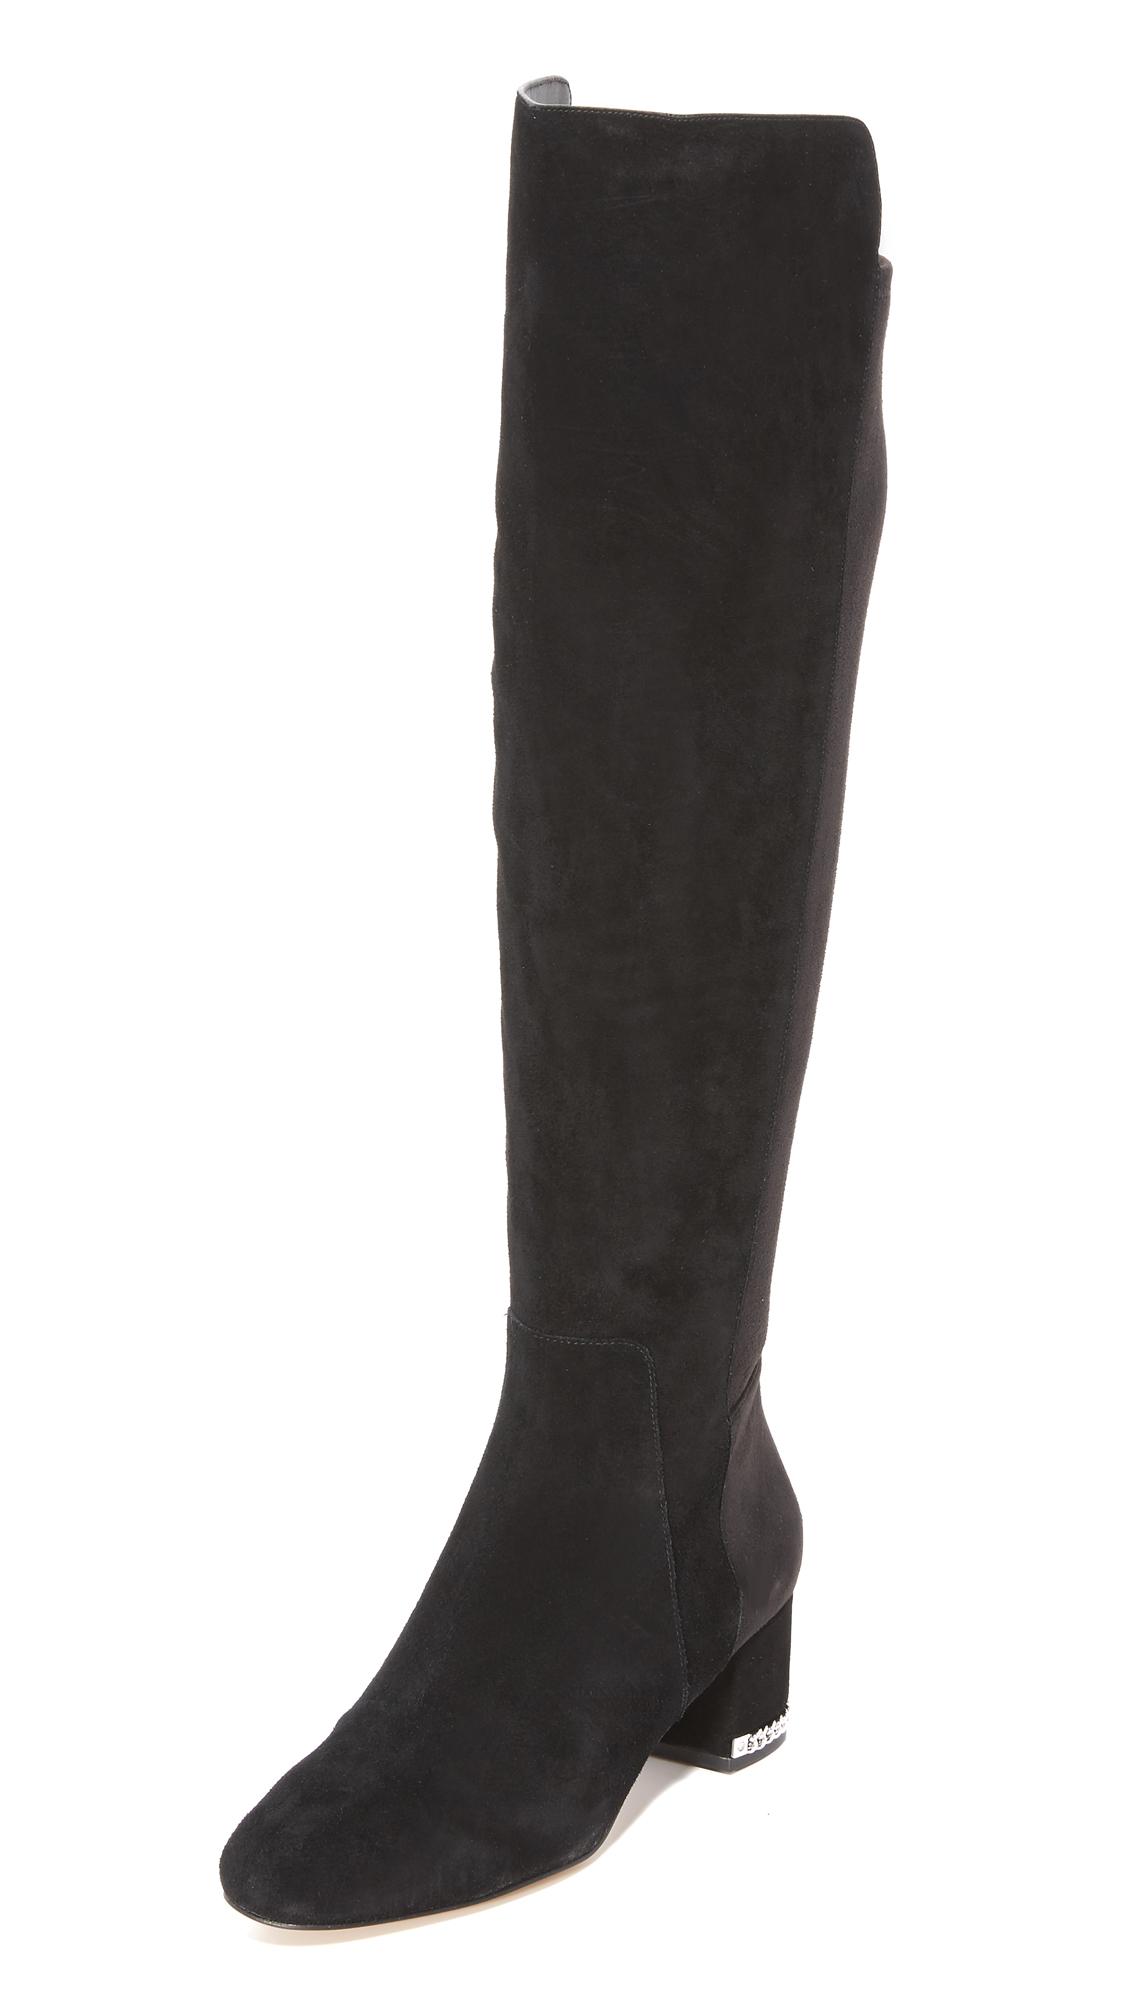 Michael Michael Kors Sabrina Over The Knee Boots - Black